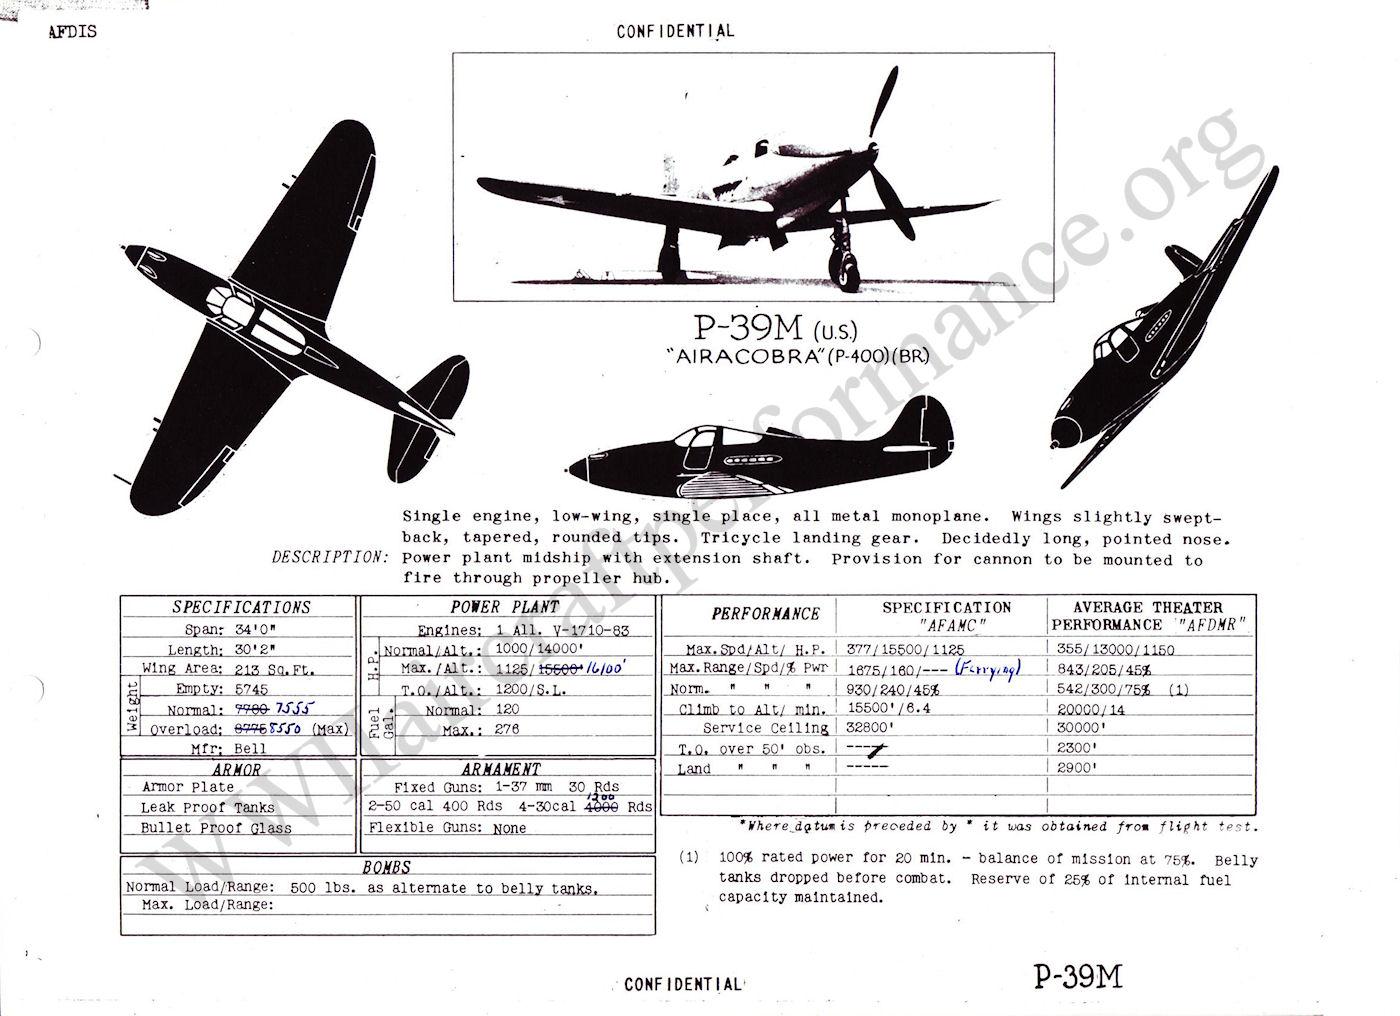 P 39 Performance Tests